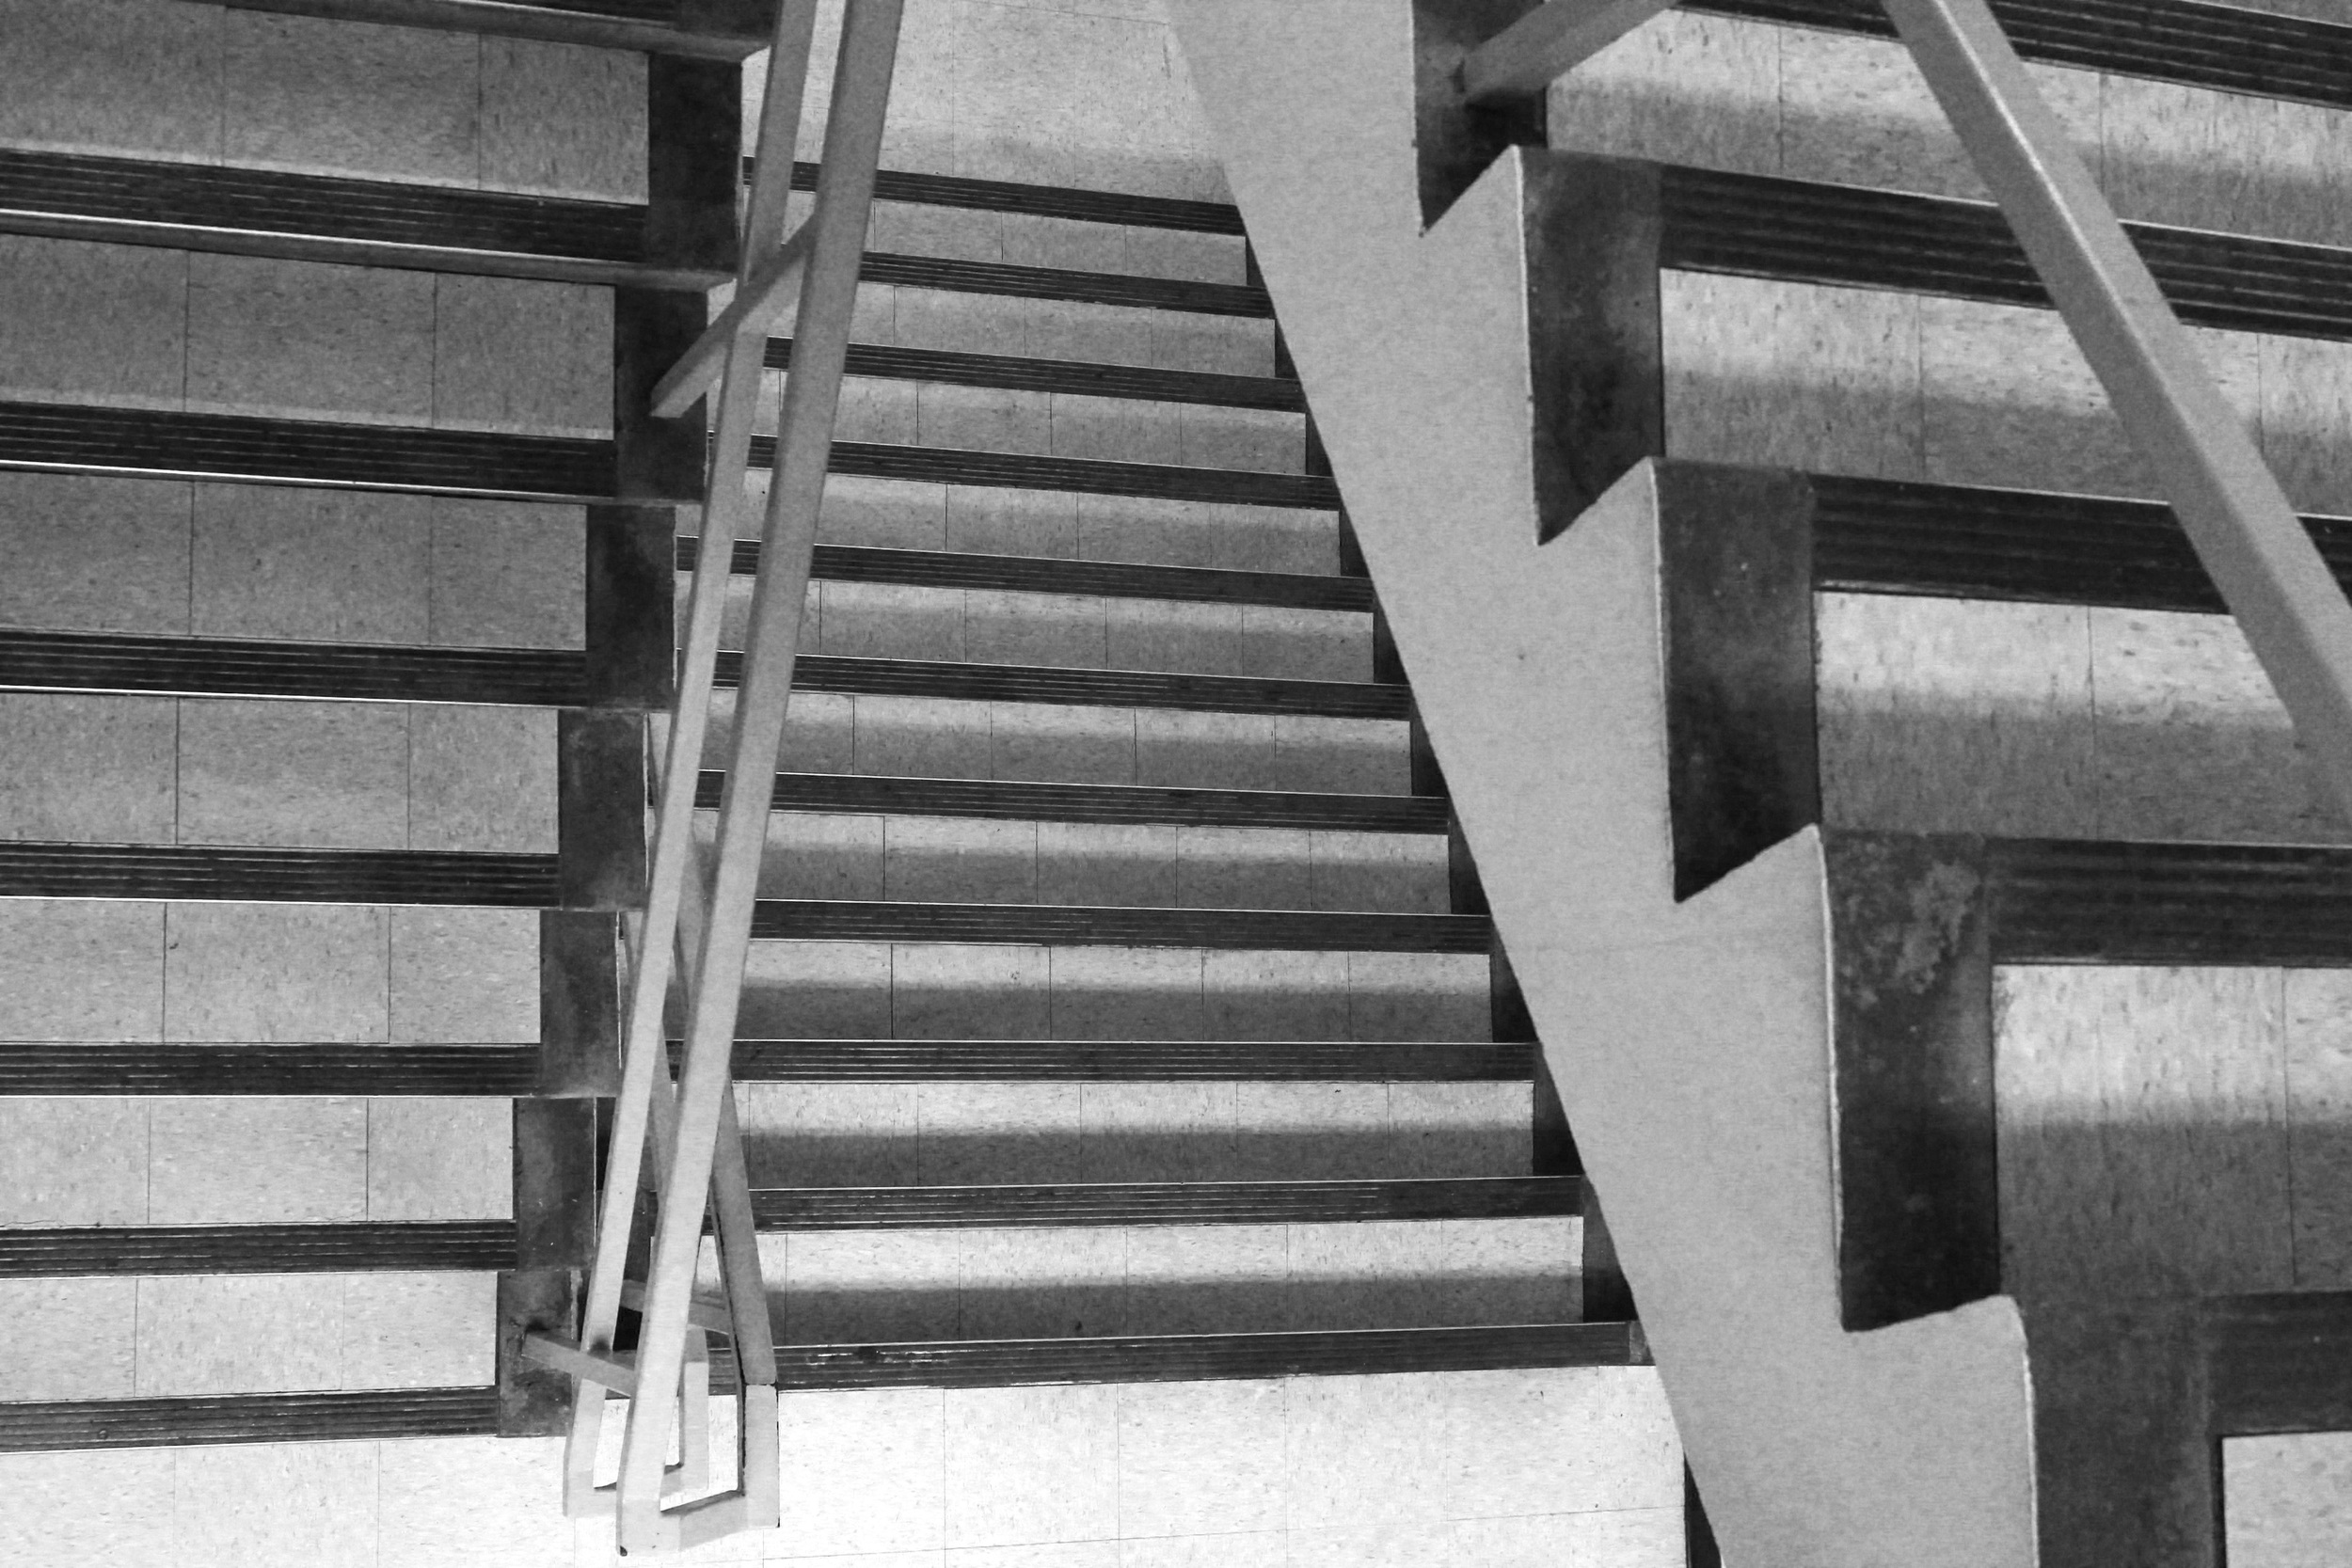 Constructivist Photo 2